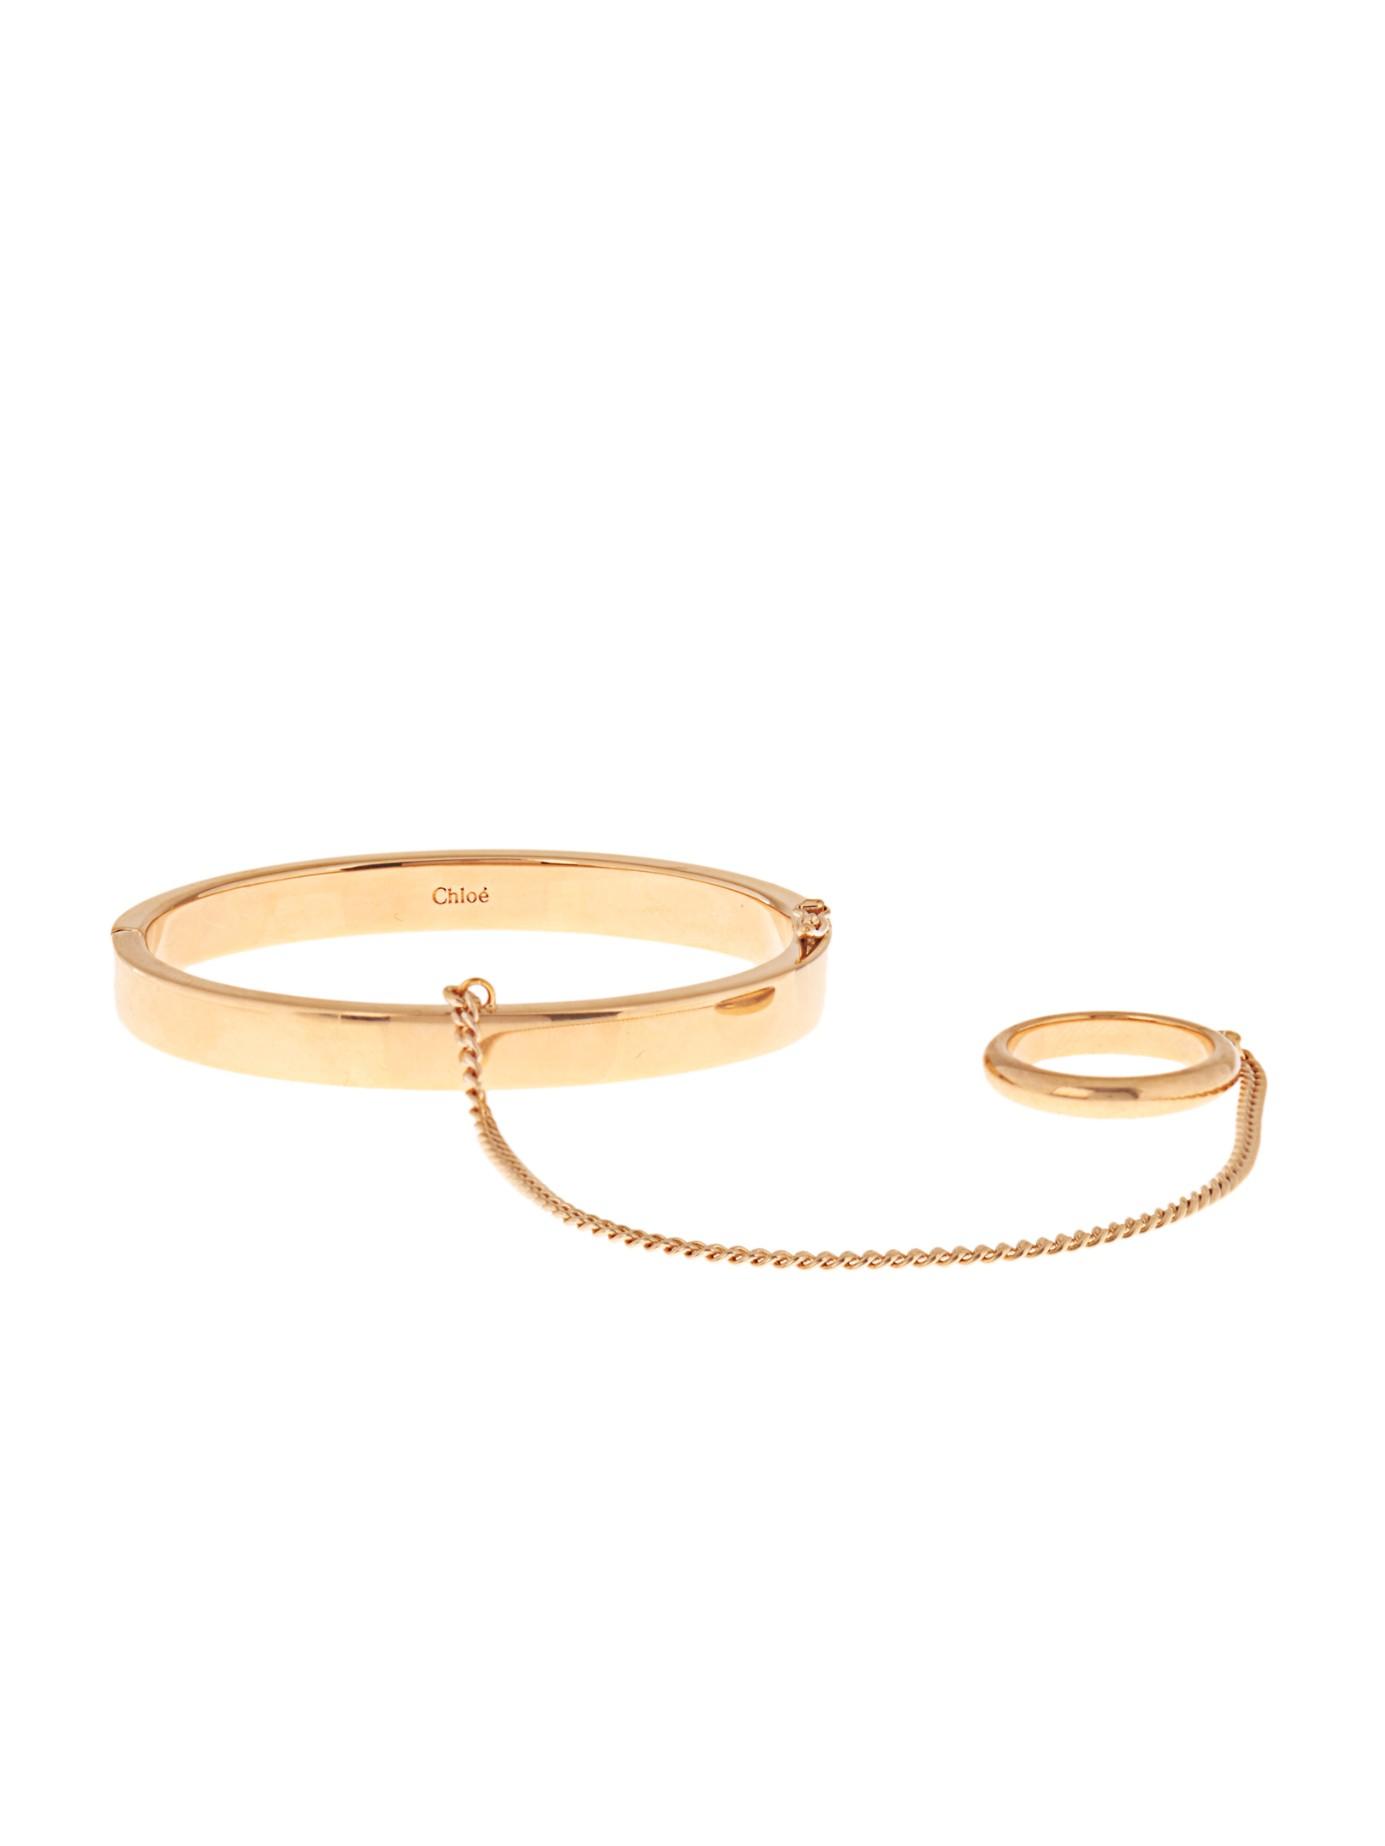 geometric bracelet cuff - Metallic Chloé 8Ae150hrW7